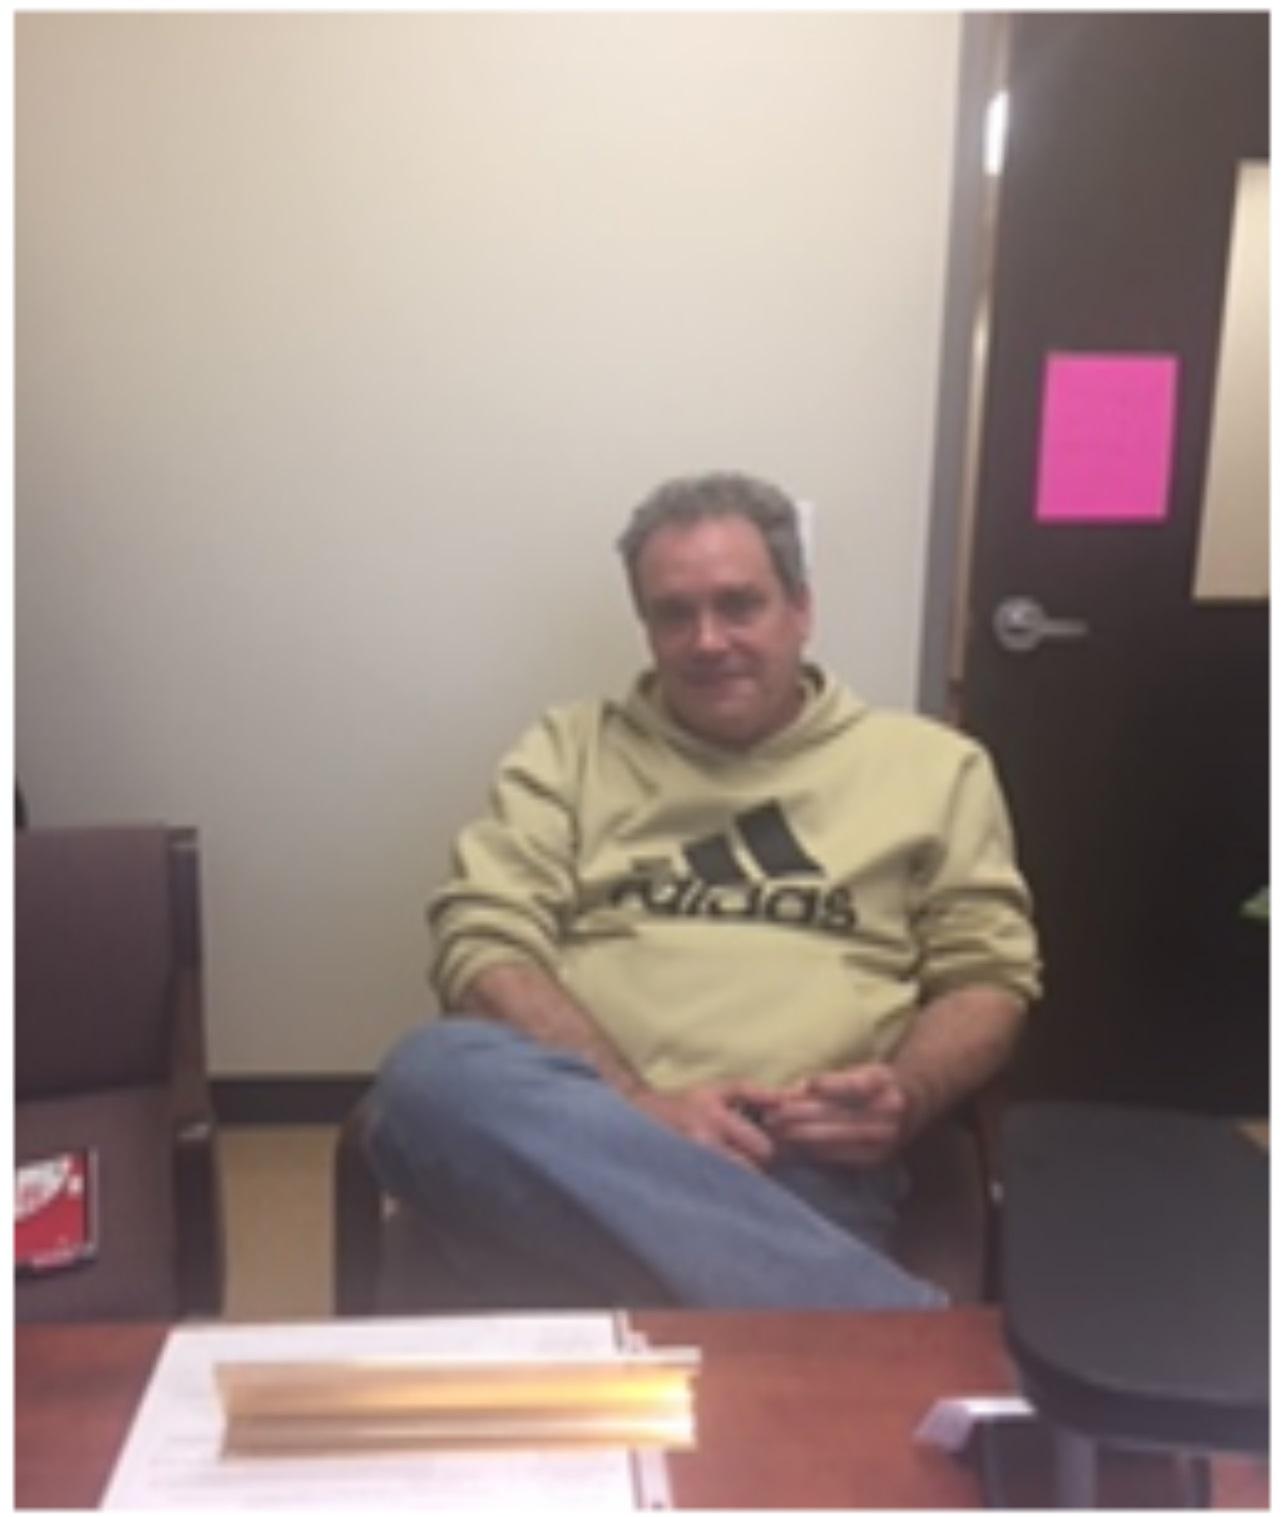 Mr. M has turned his life around since entering ESR's Housing program